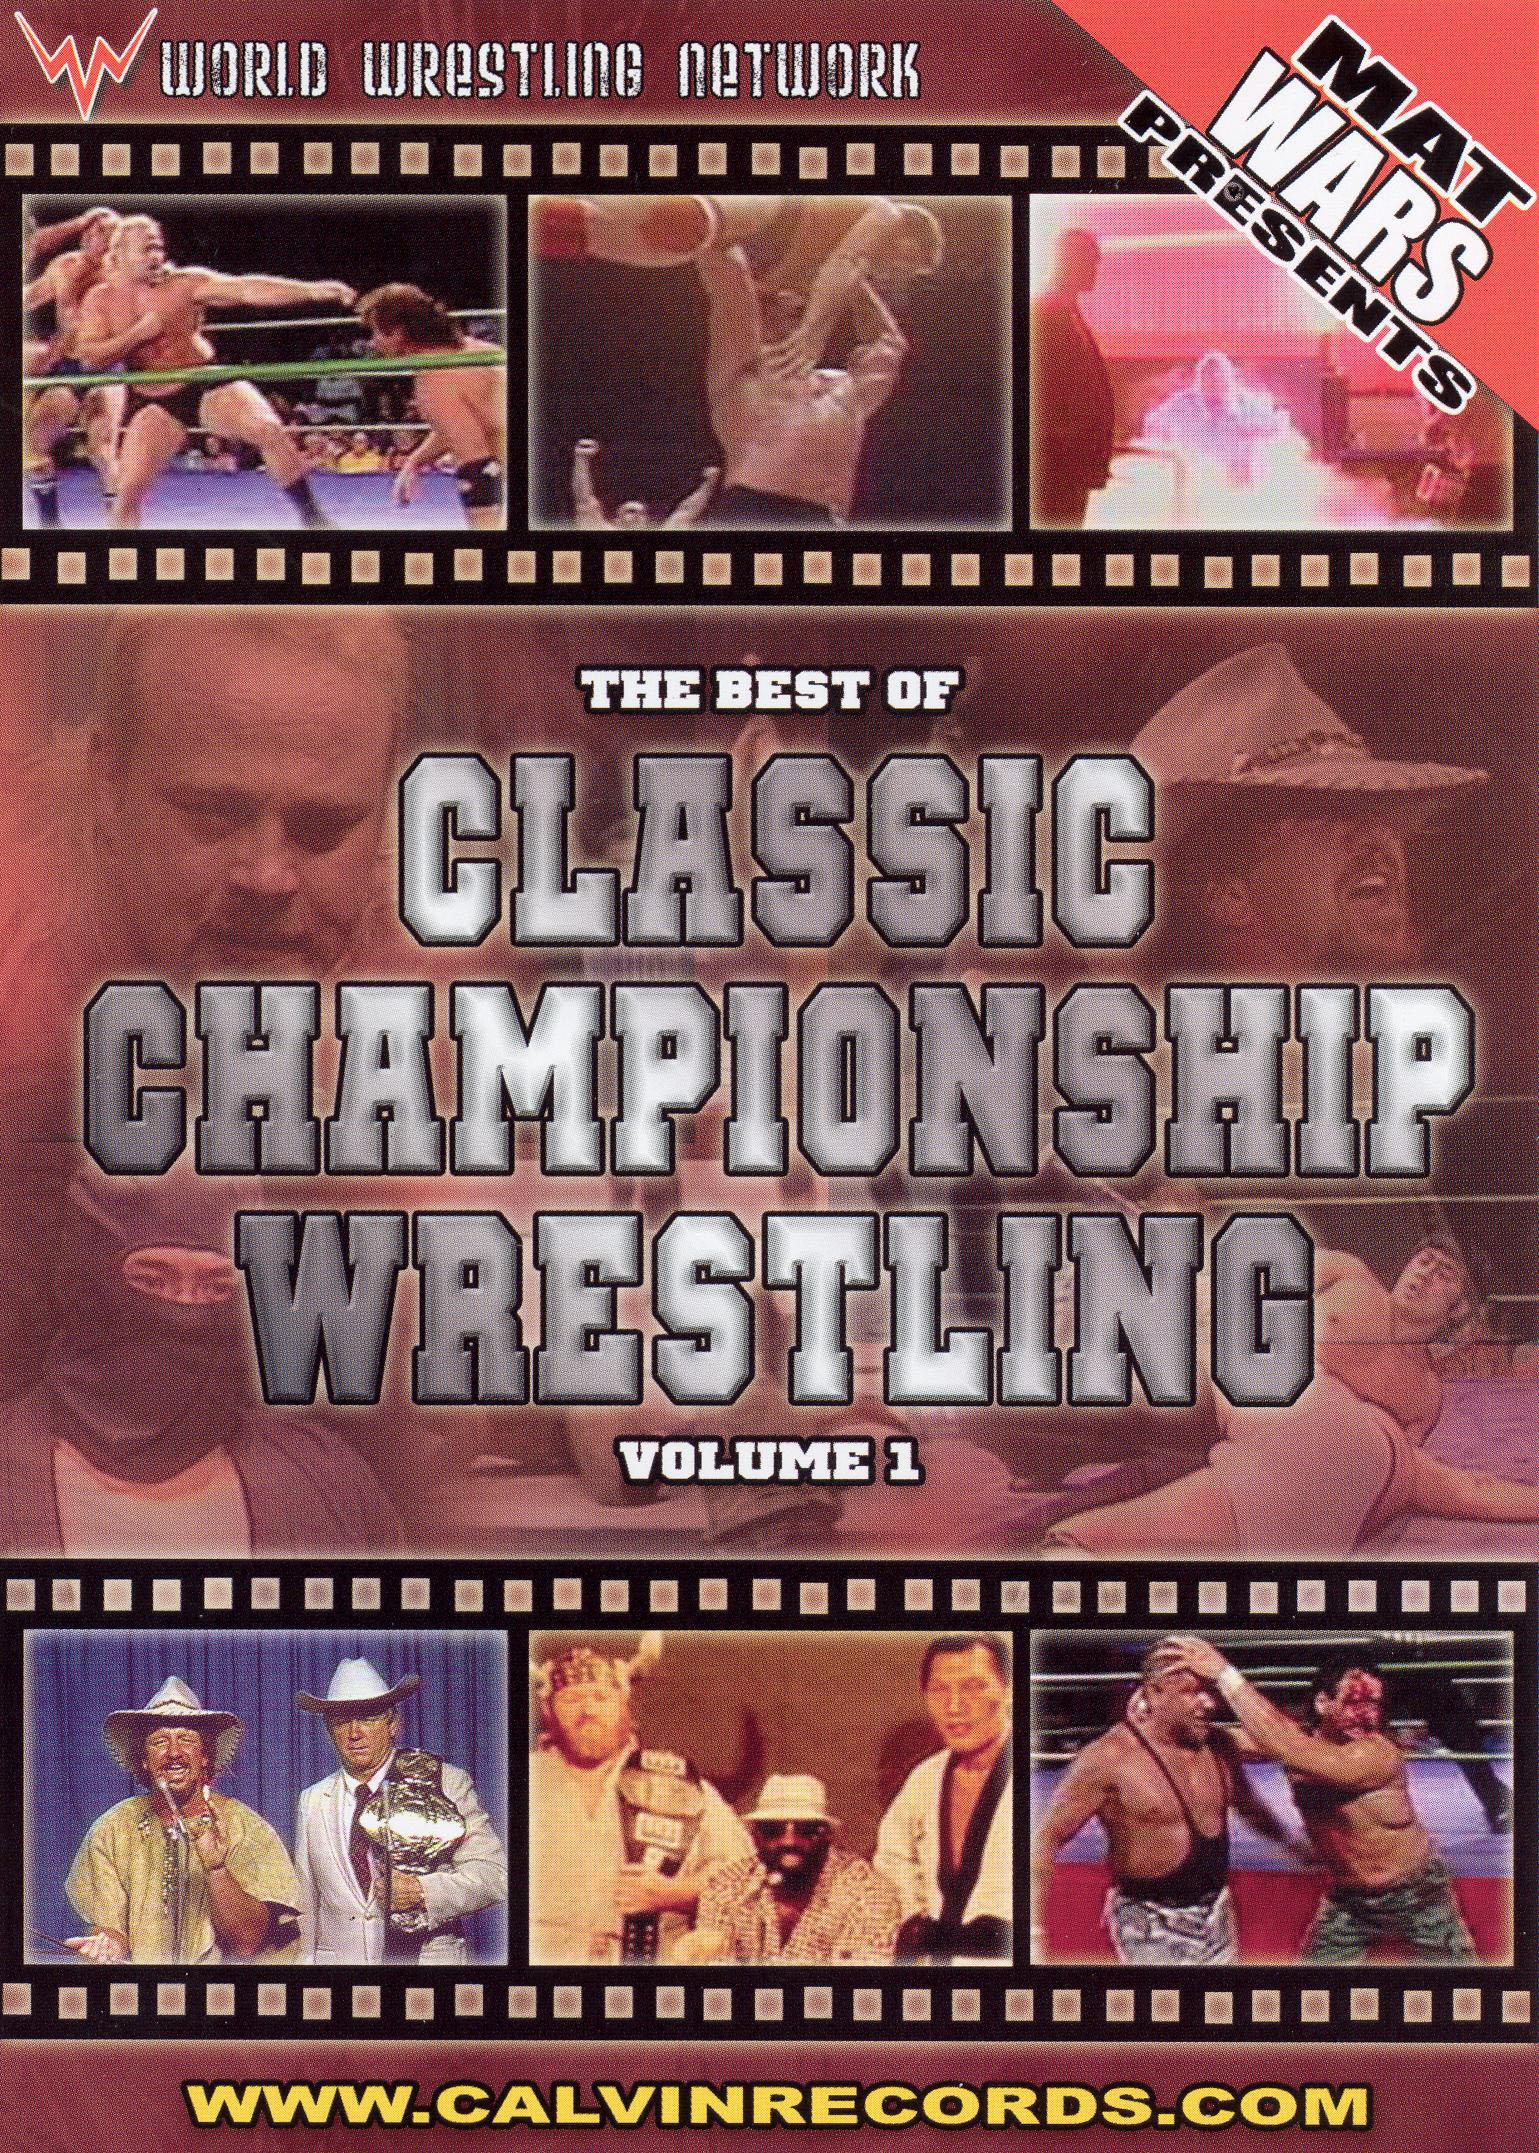 Mat Wars Presents: Best of Classic Championship Wrestling